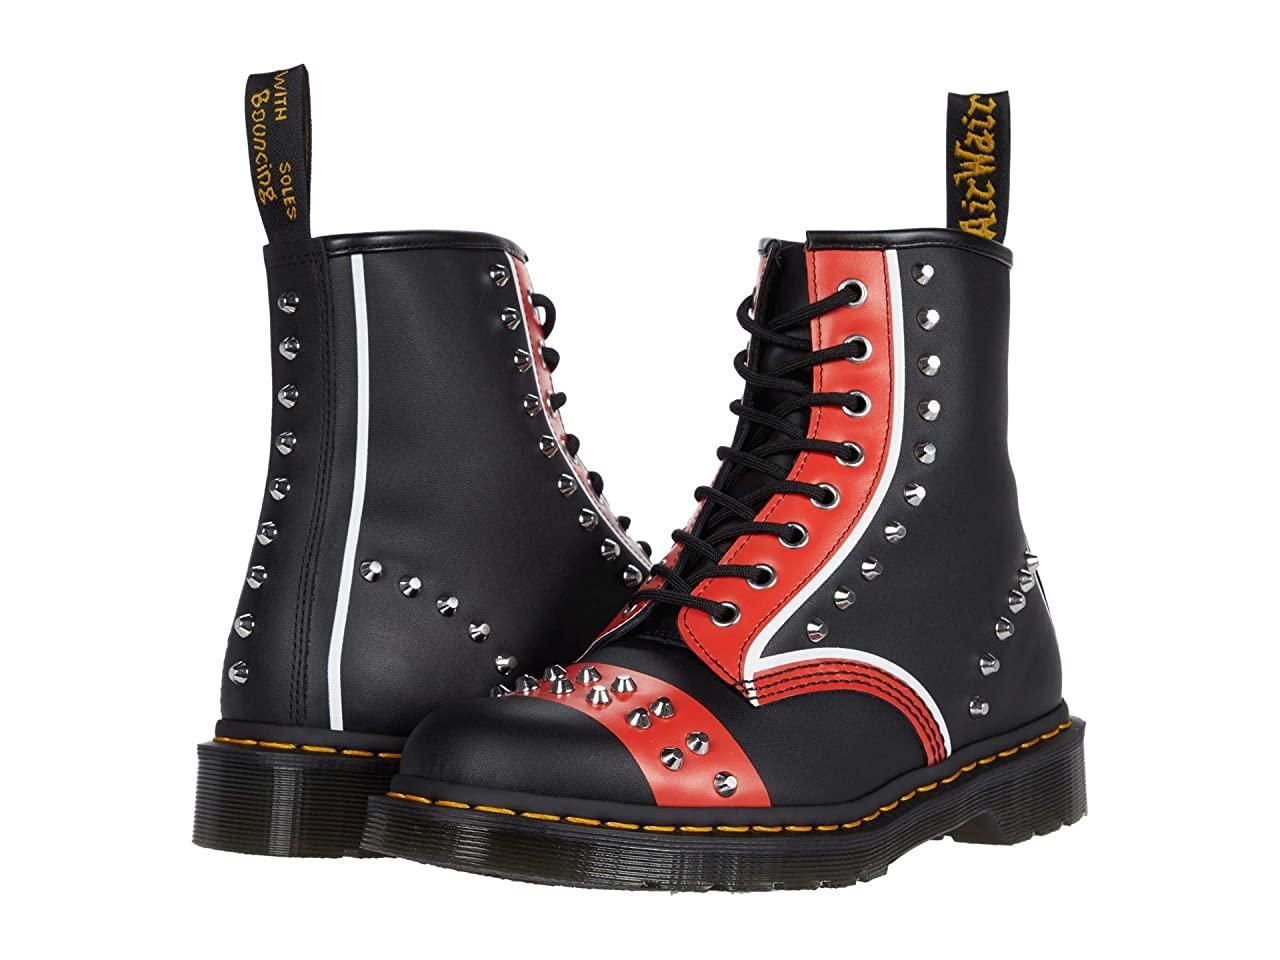 Ботинки/Сапоги (Оригинал) Dr. Martens 1460 Stud Black/Red/White